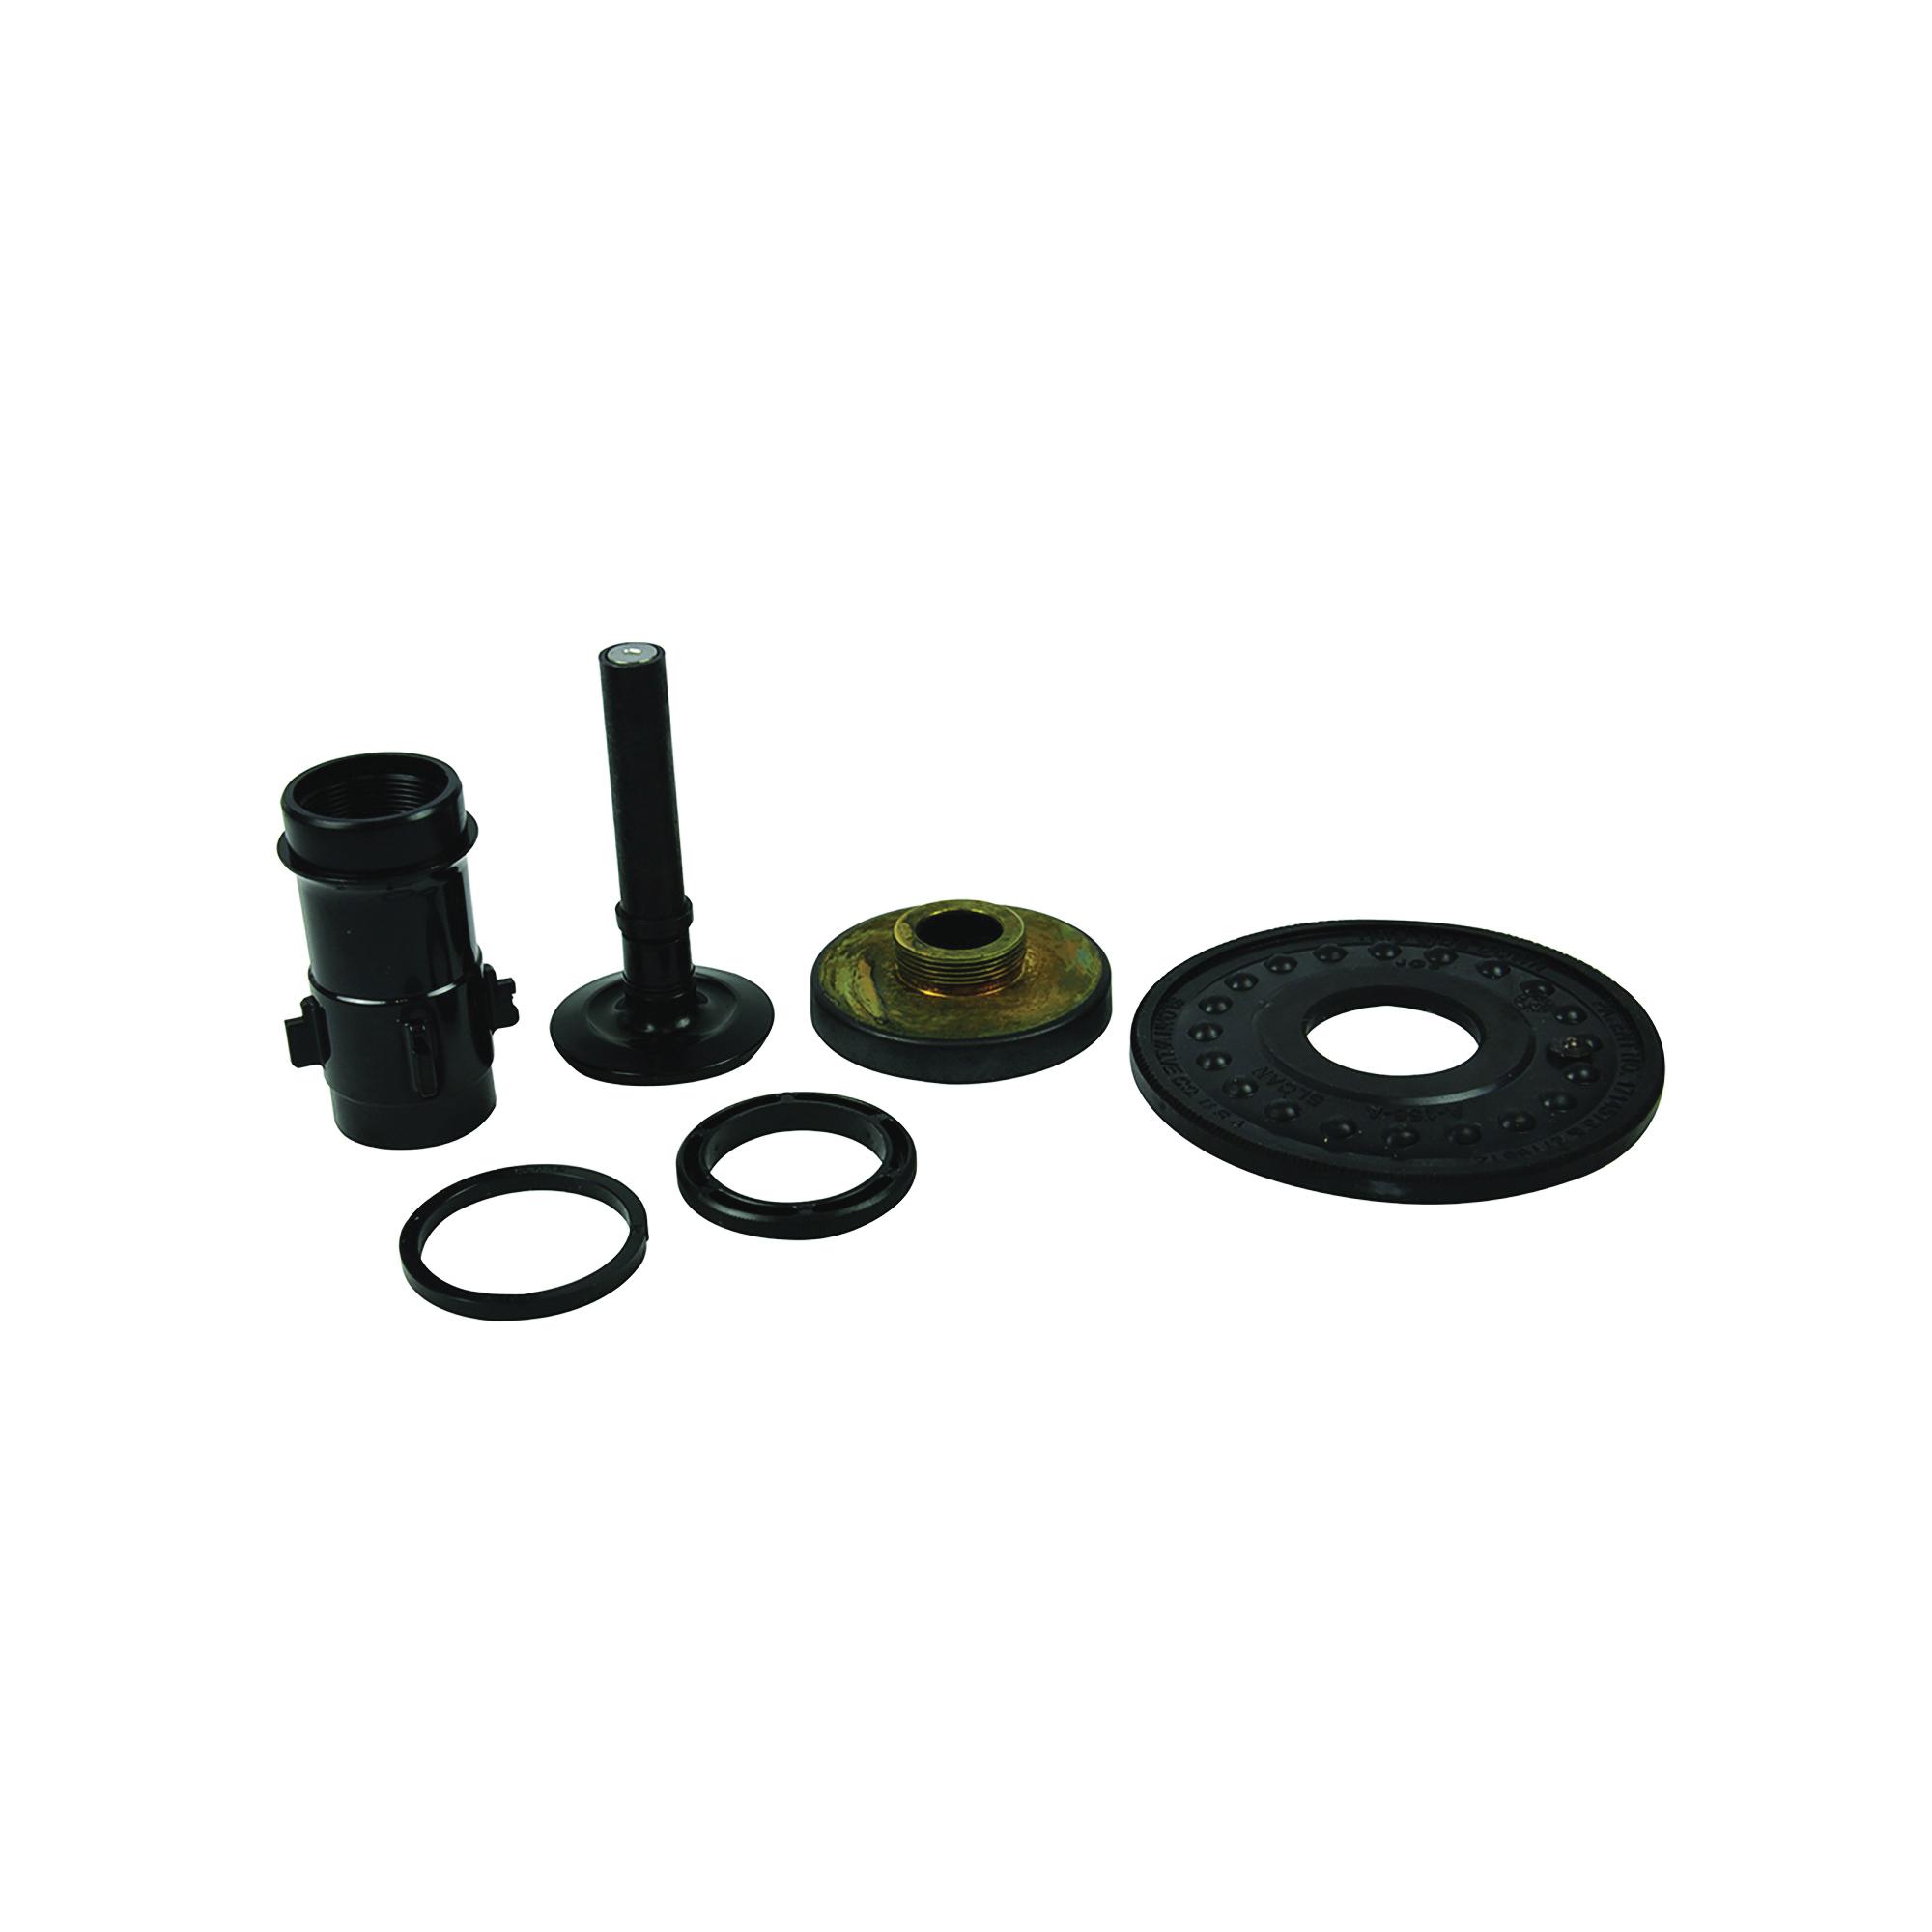 Picture of Danco 37059 Urinal Repair Kit, Plastic/Rubber, Black, For: Regal 1.5 gpf Urinal Flushometers